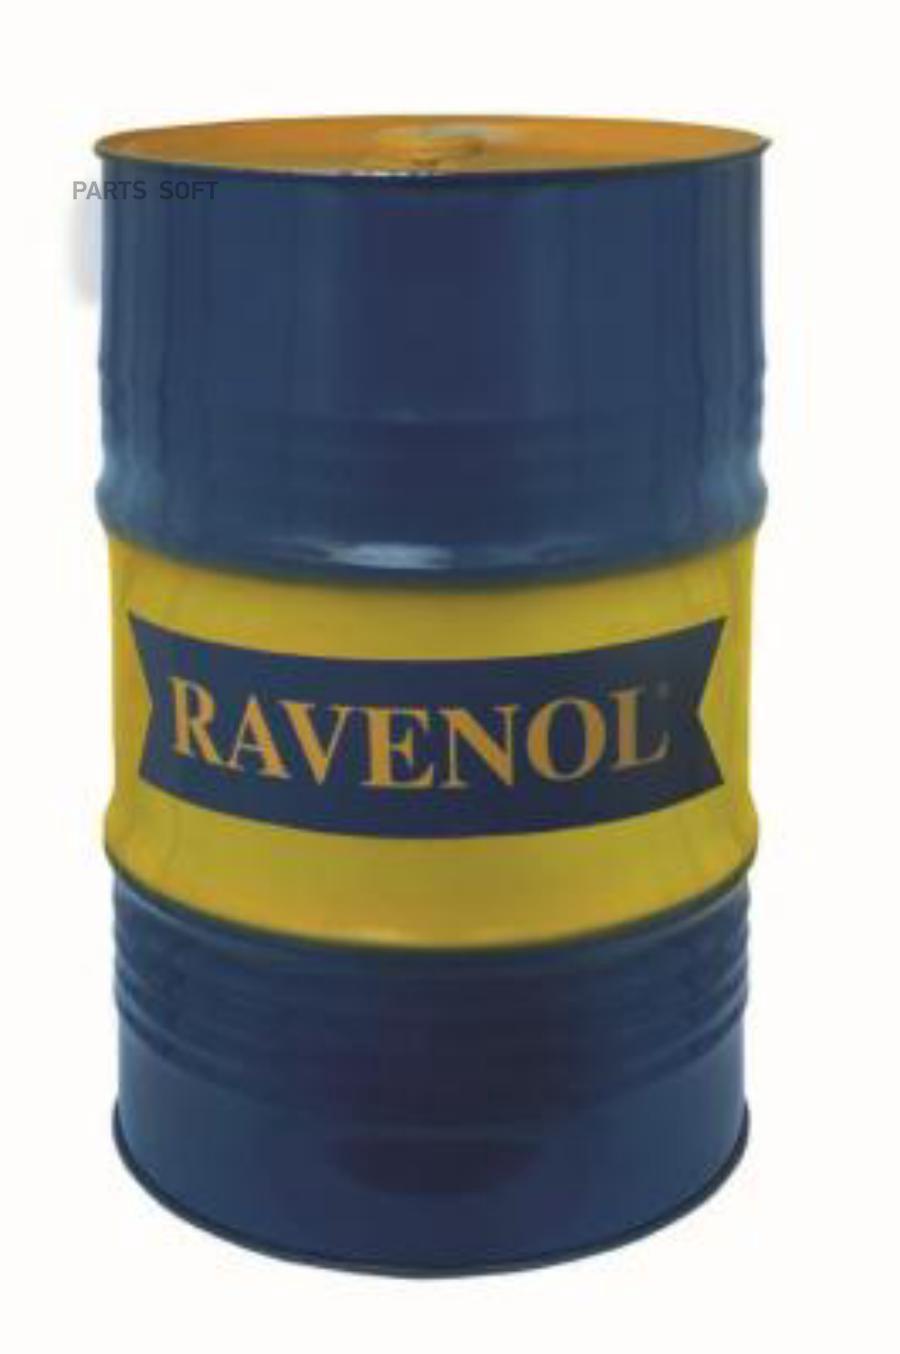 Ravenol AUTOMATIK-GETRIEBE-OEL T-IV FLUID (208Л) .